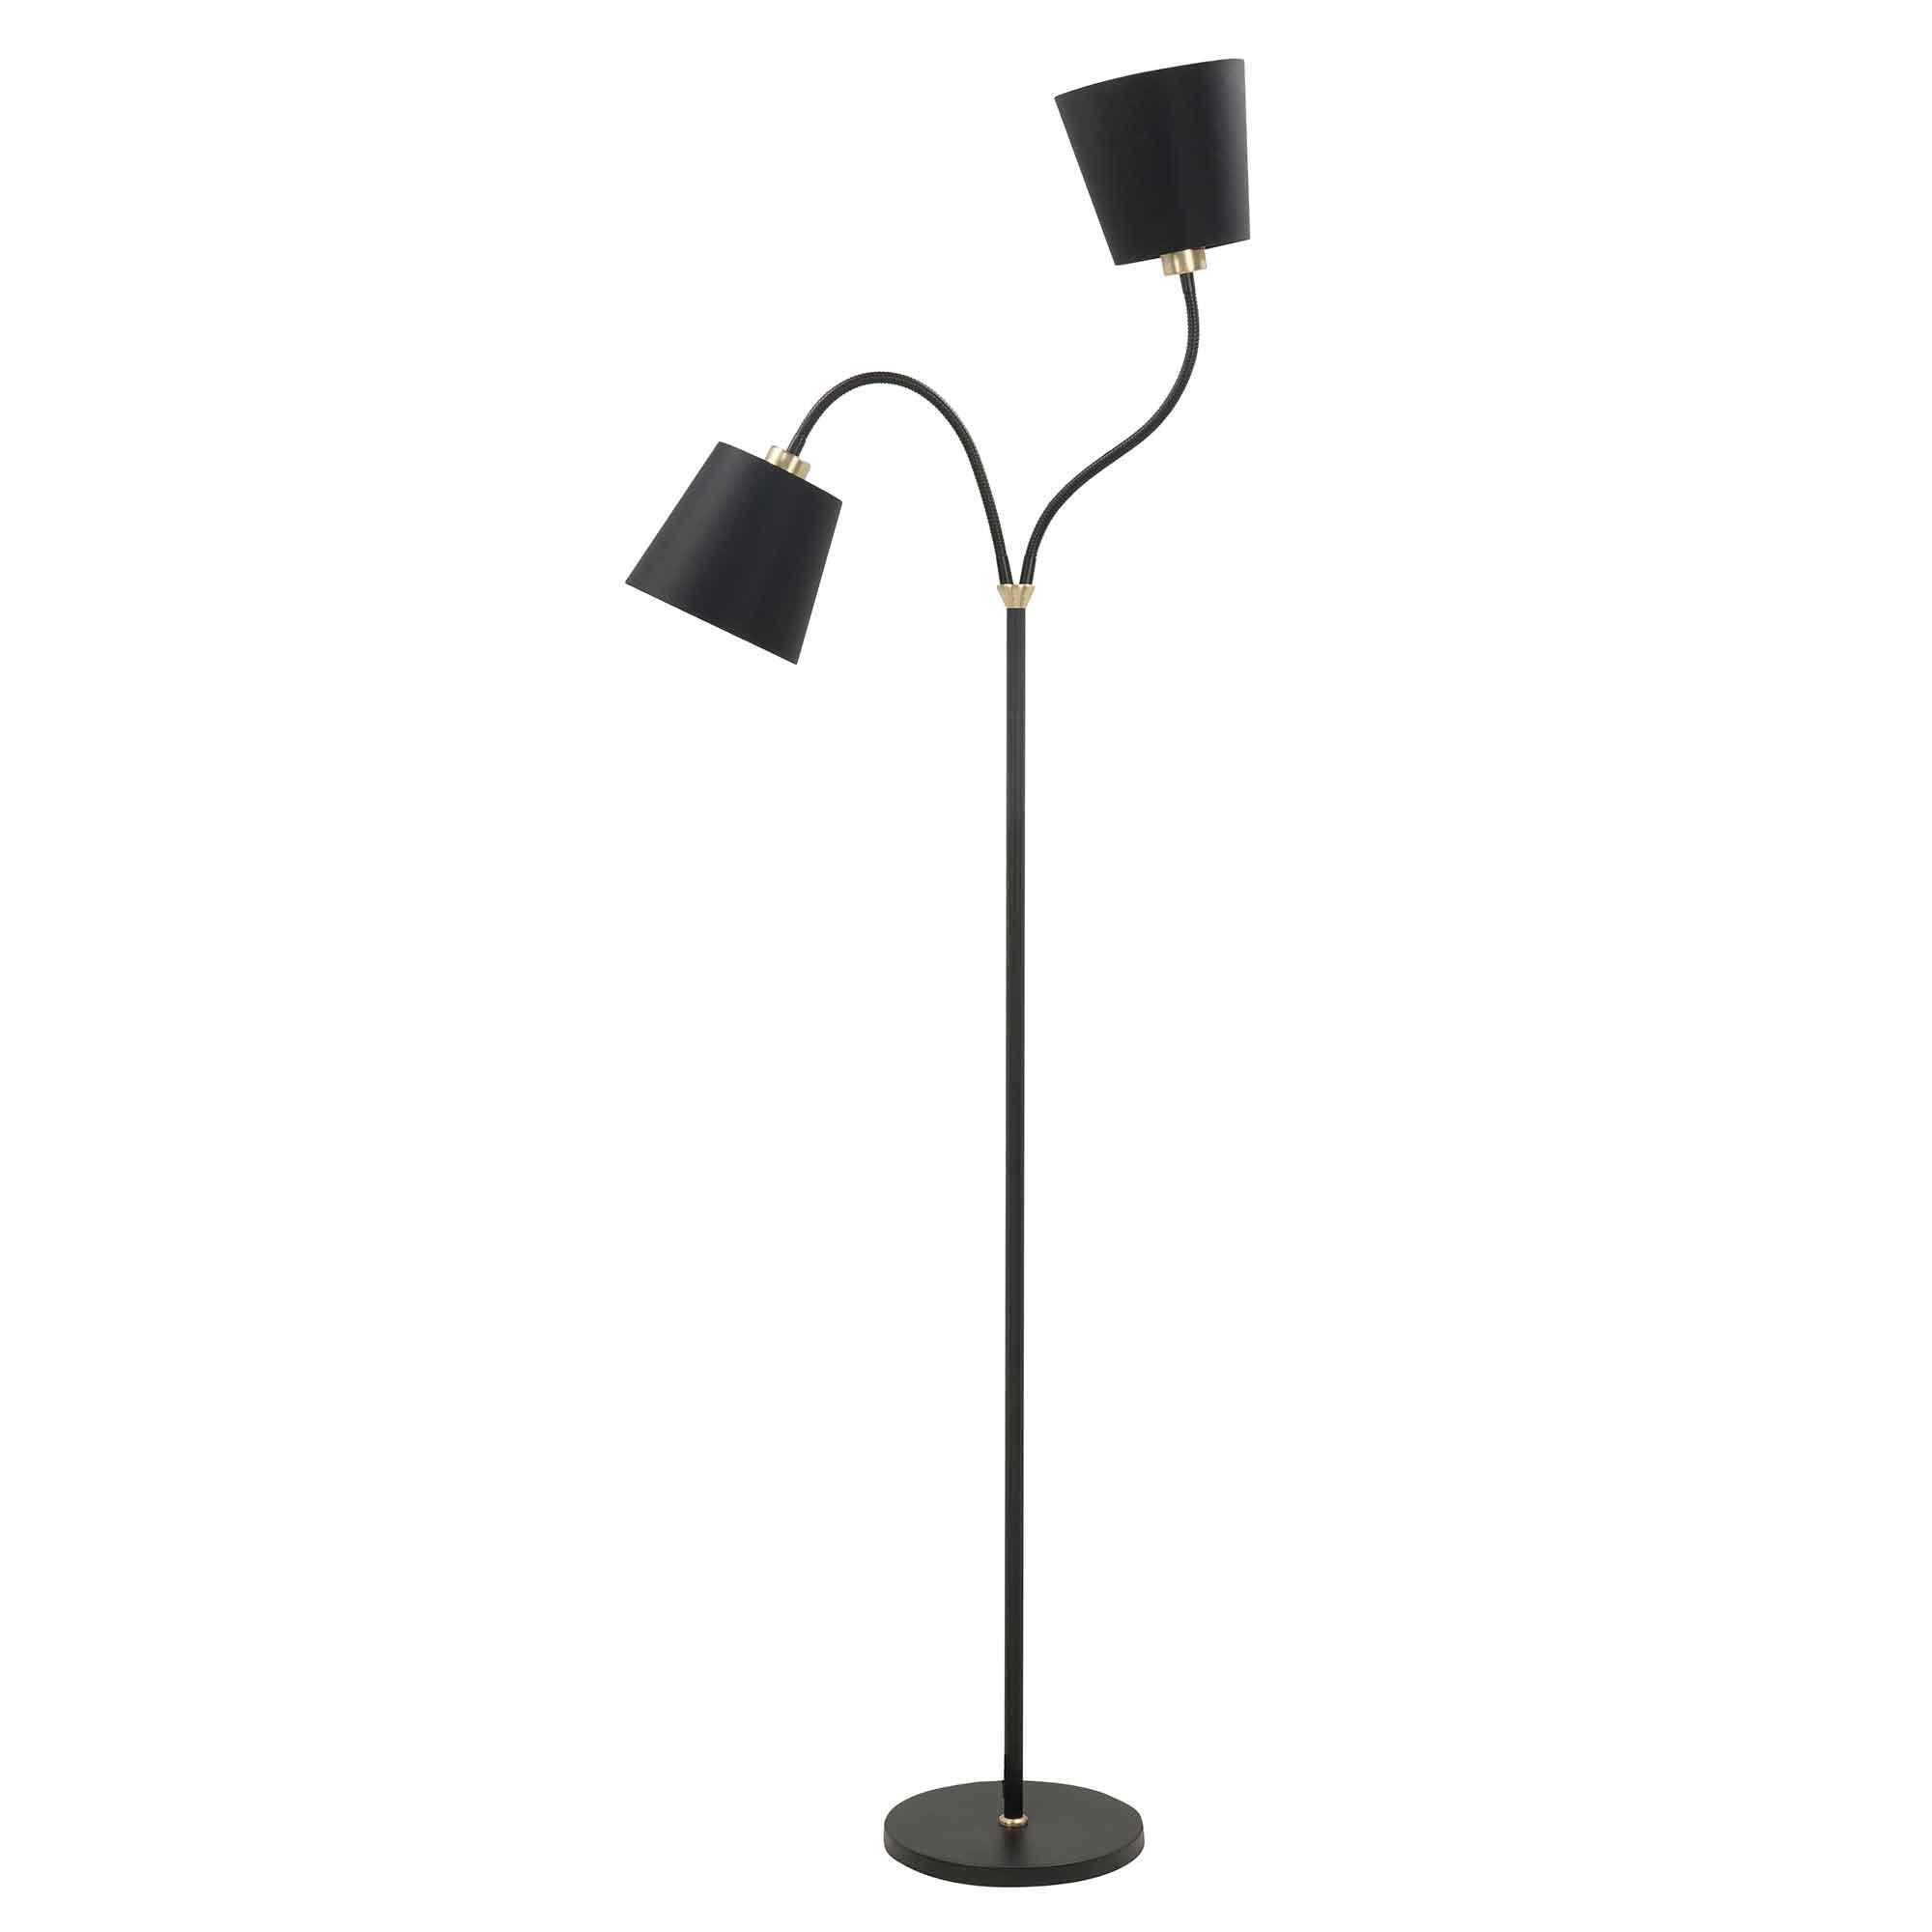 Highlight Vloerlamp Texas 2 lichts H 140 cm zwart goud